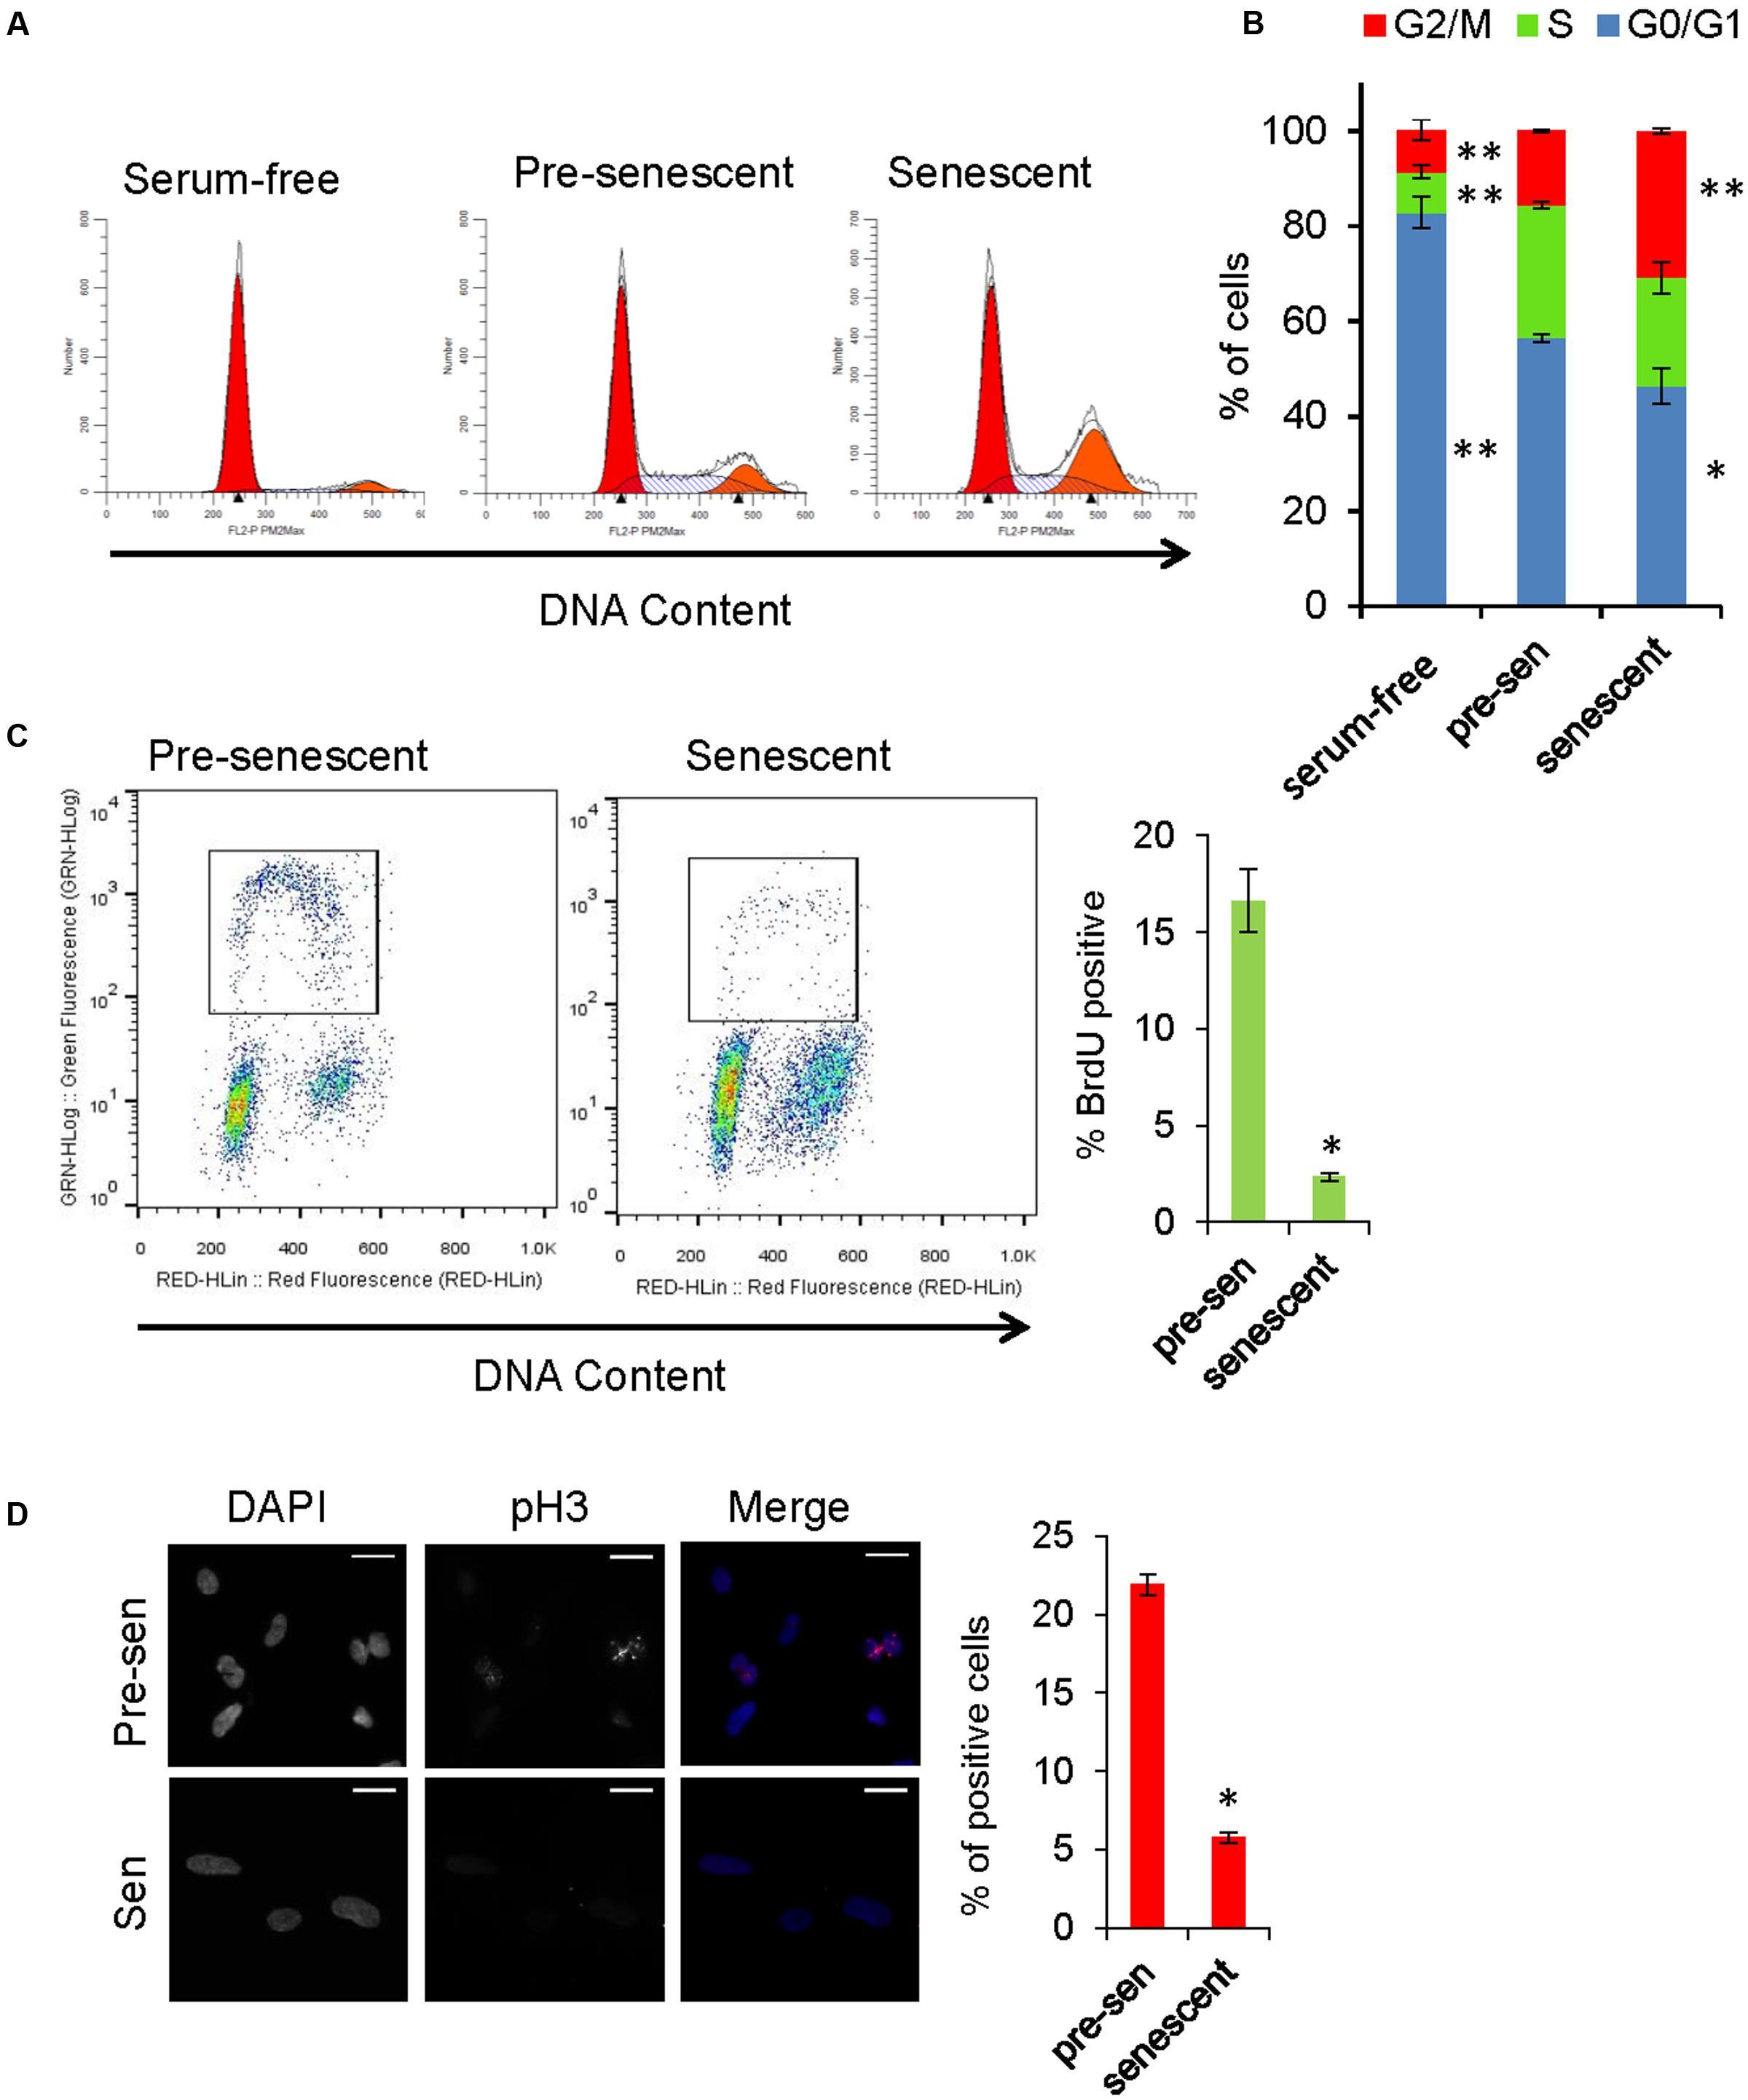 LNP023 blocks KRN-induced arthritis. Arthritis was induced